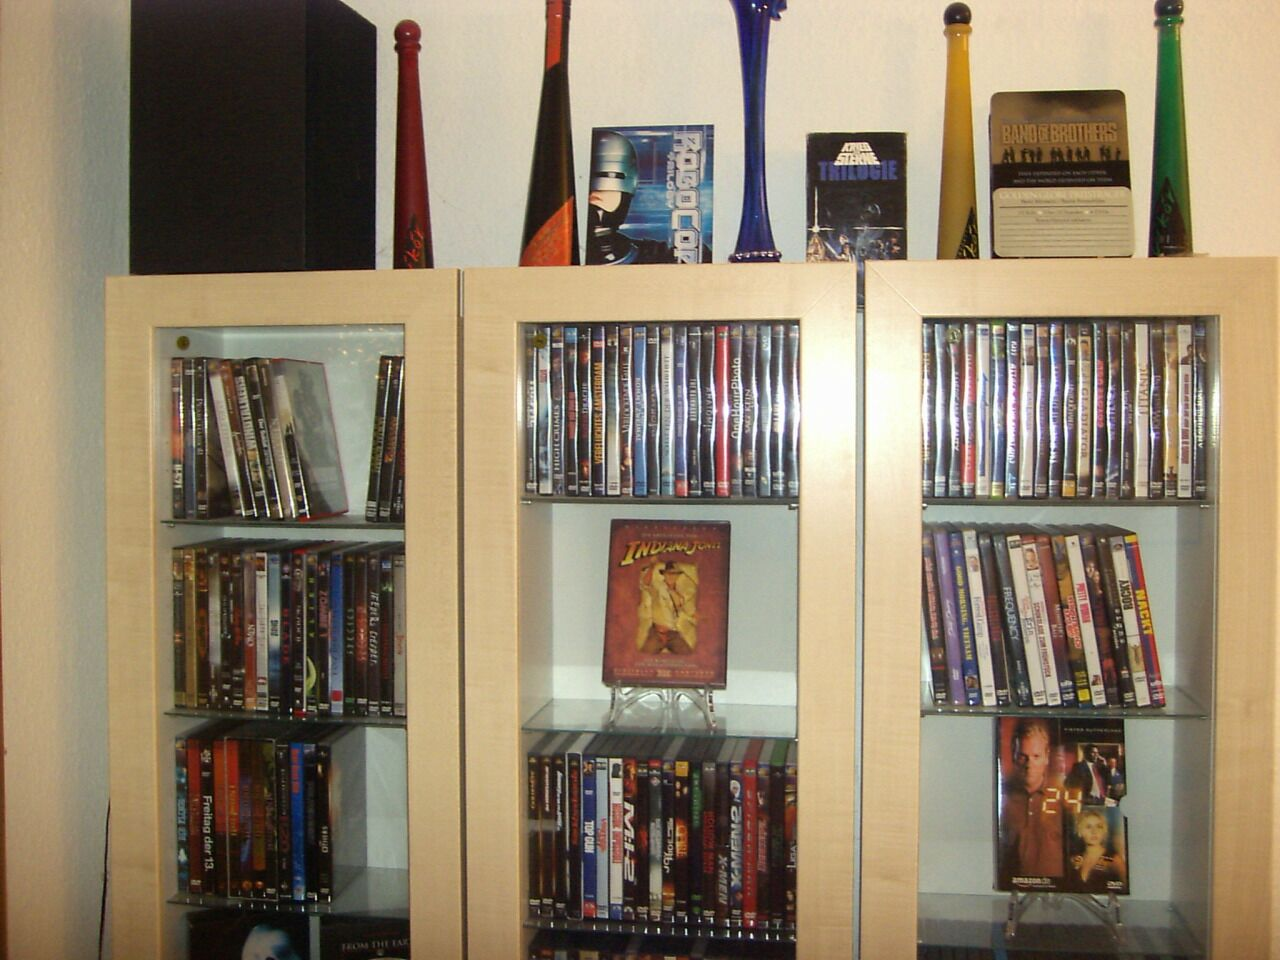 DVD Sammlung 400 Stck Wie am Besten verkaufen